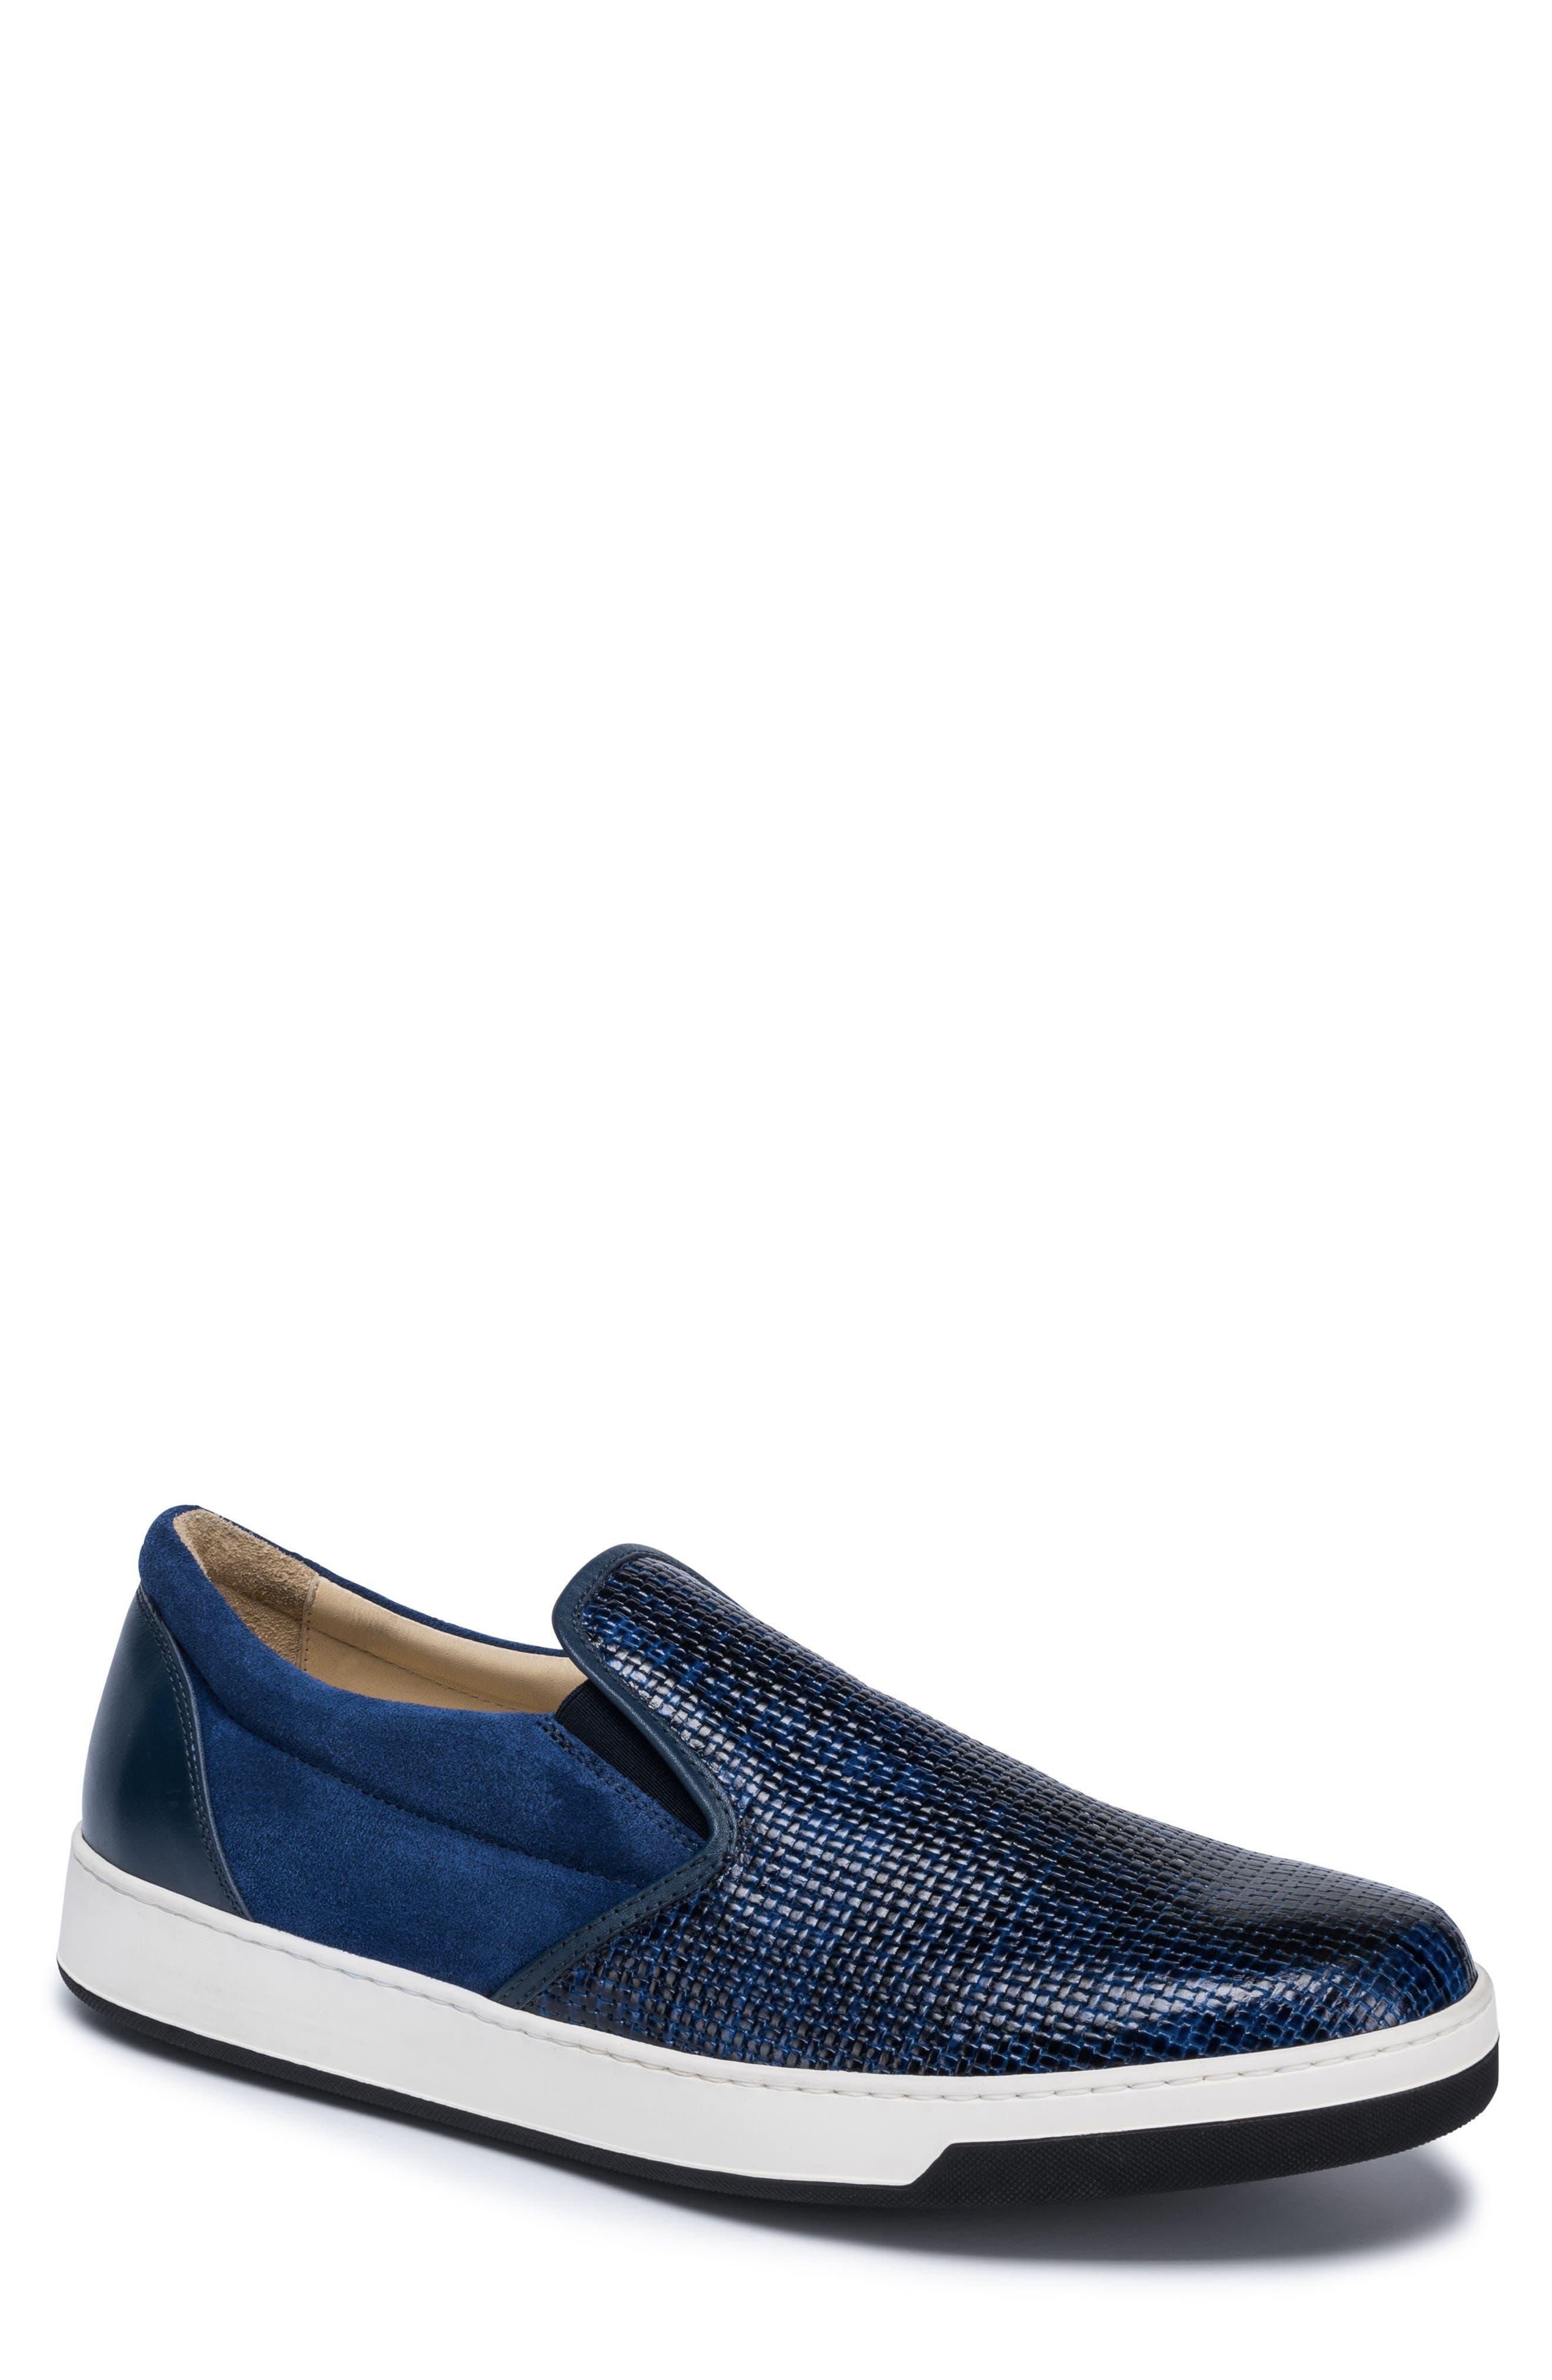 Cinque Terre Woven Slip-On Sneaker,                             Main thumbnail 2, color,